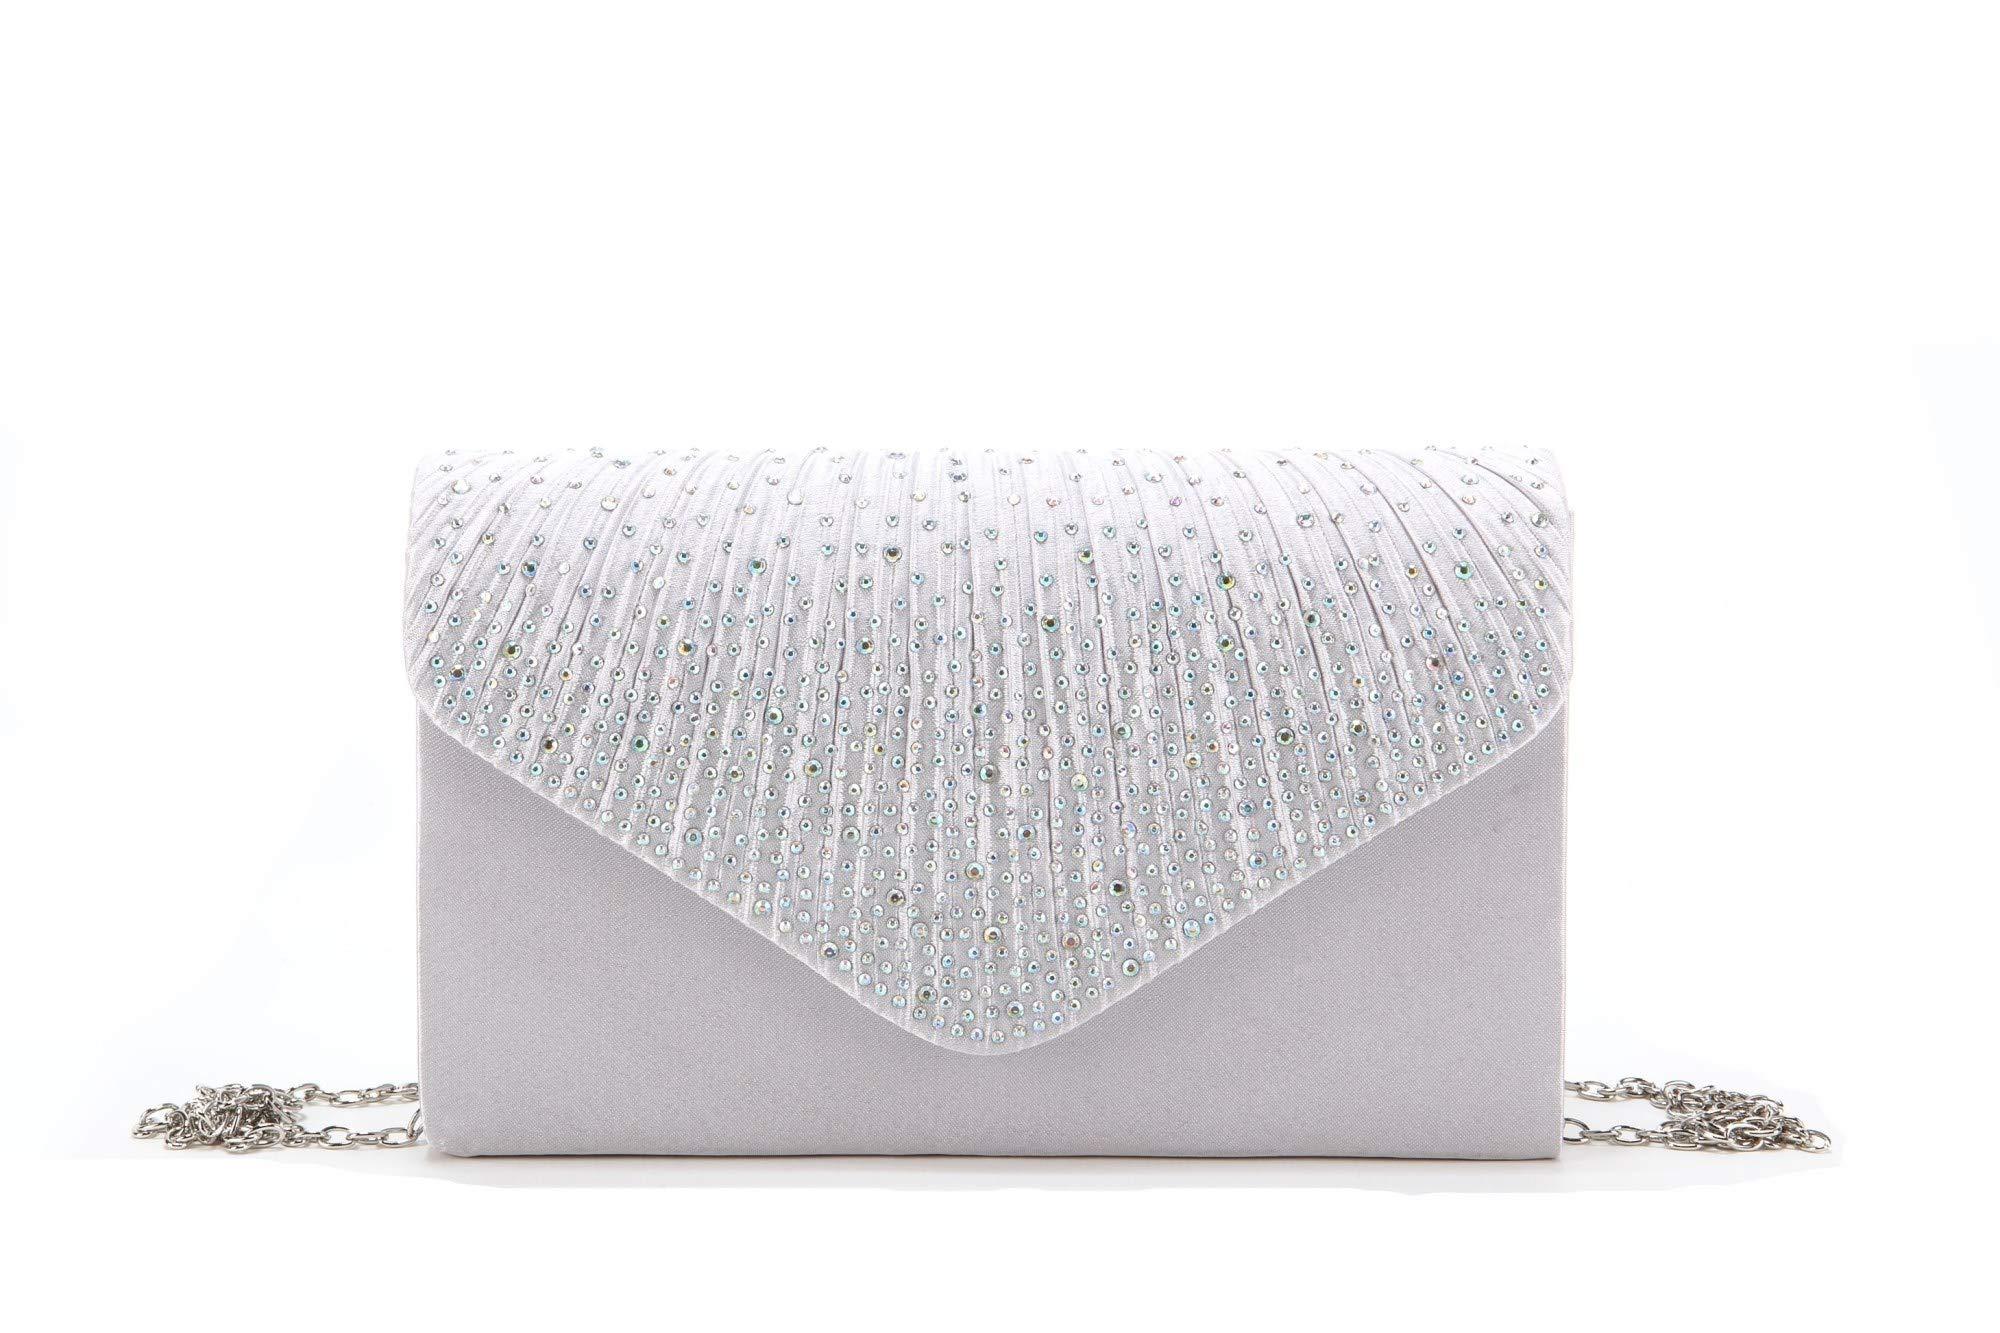 d1a2f8b8d822 Nodykka Women Evening Envelope Rhinestone Frosted Handbag Party Bridal  Clutch Purse Shoulder Cross Body Bag